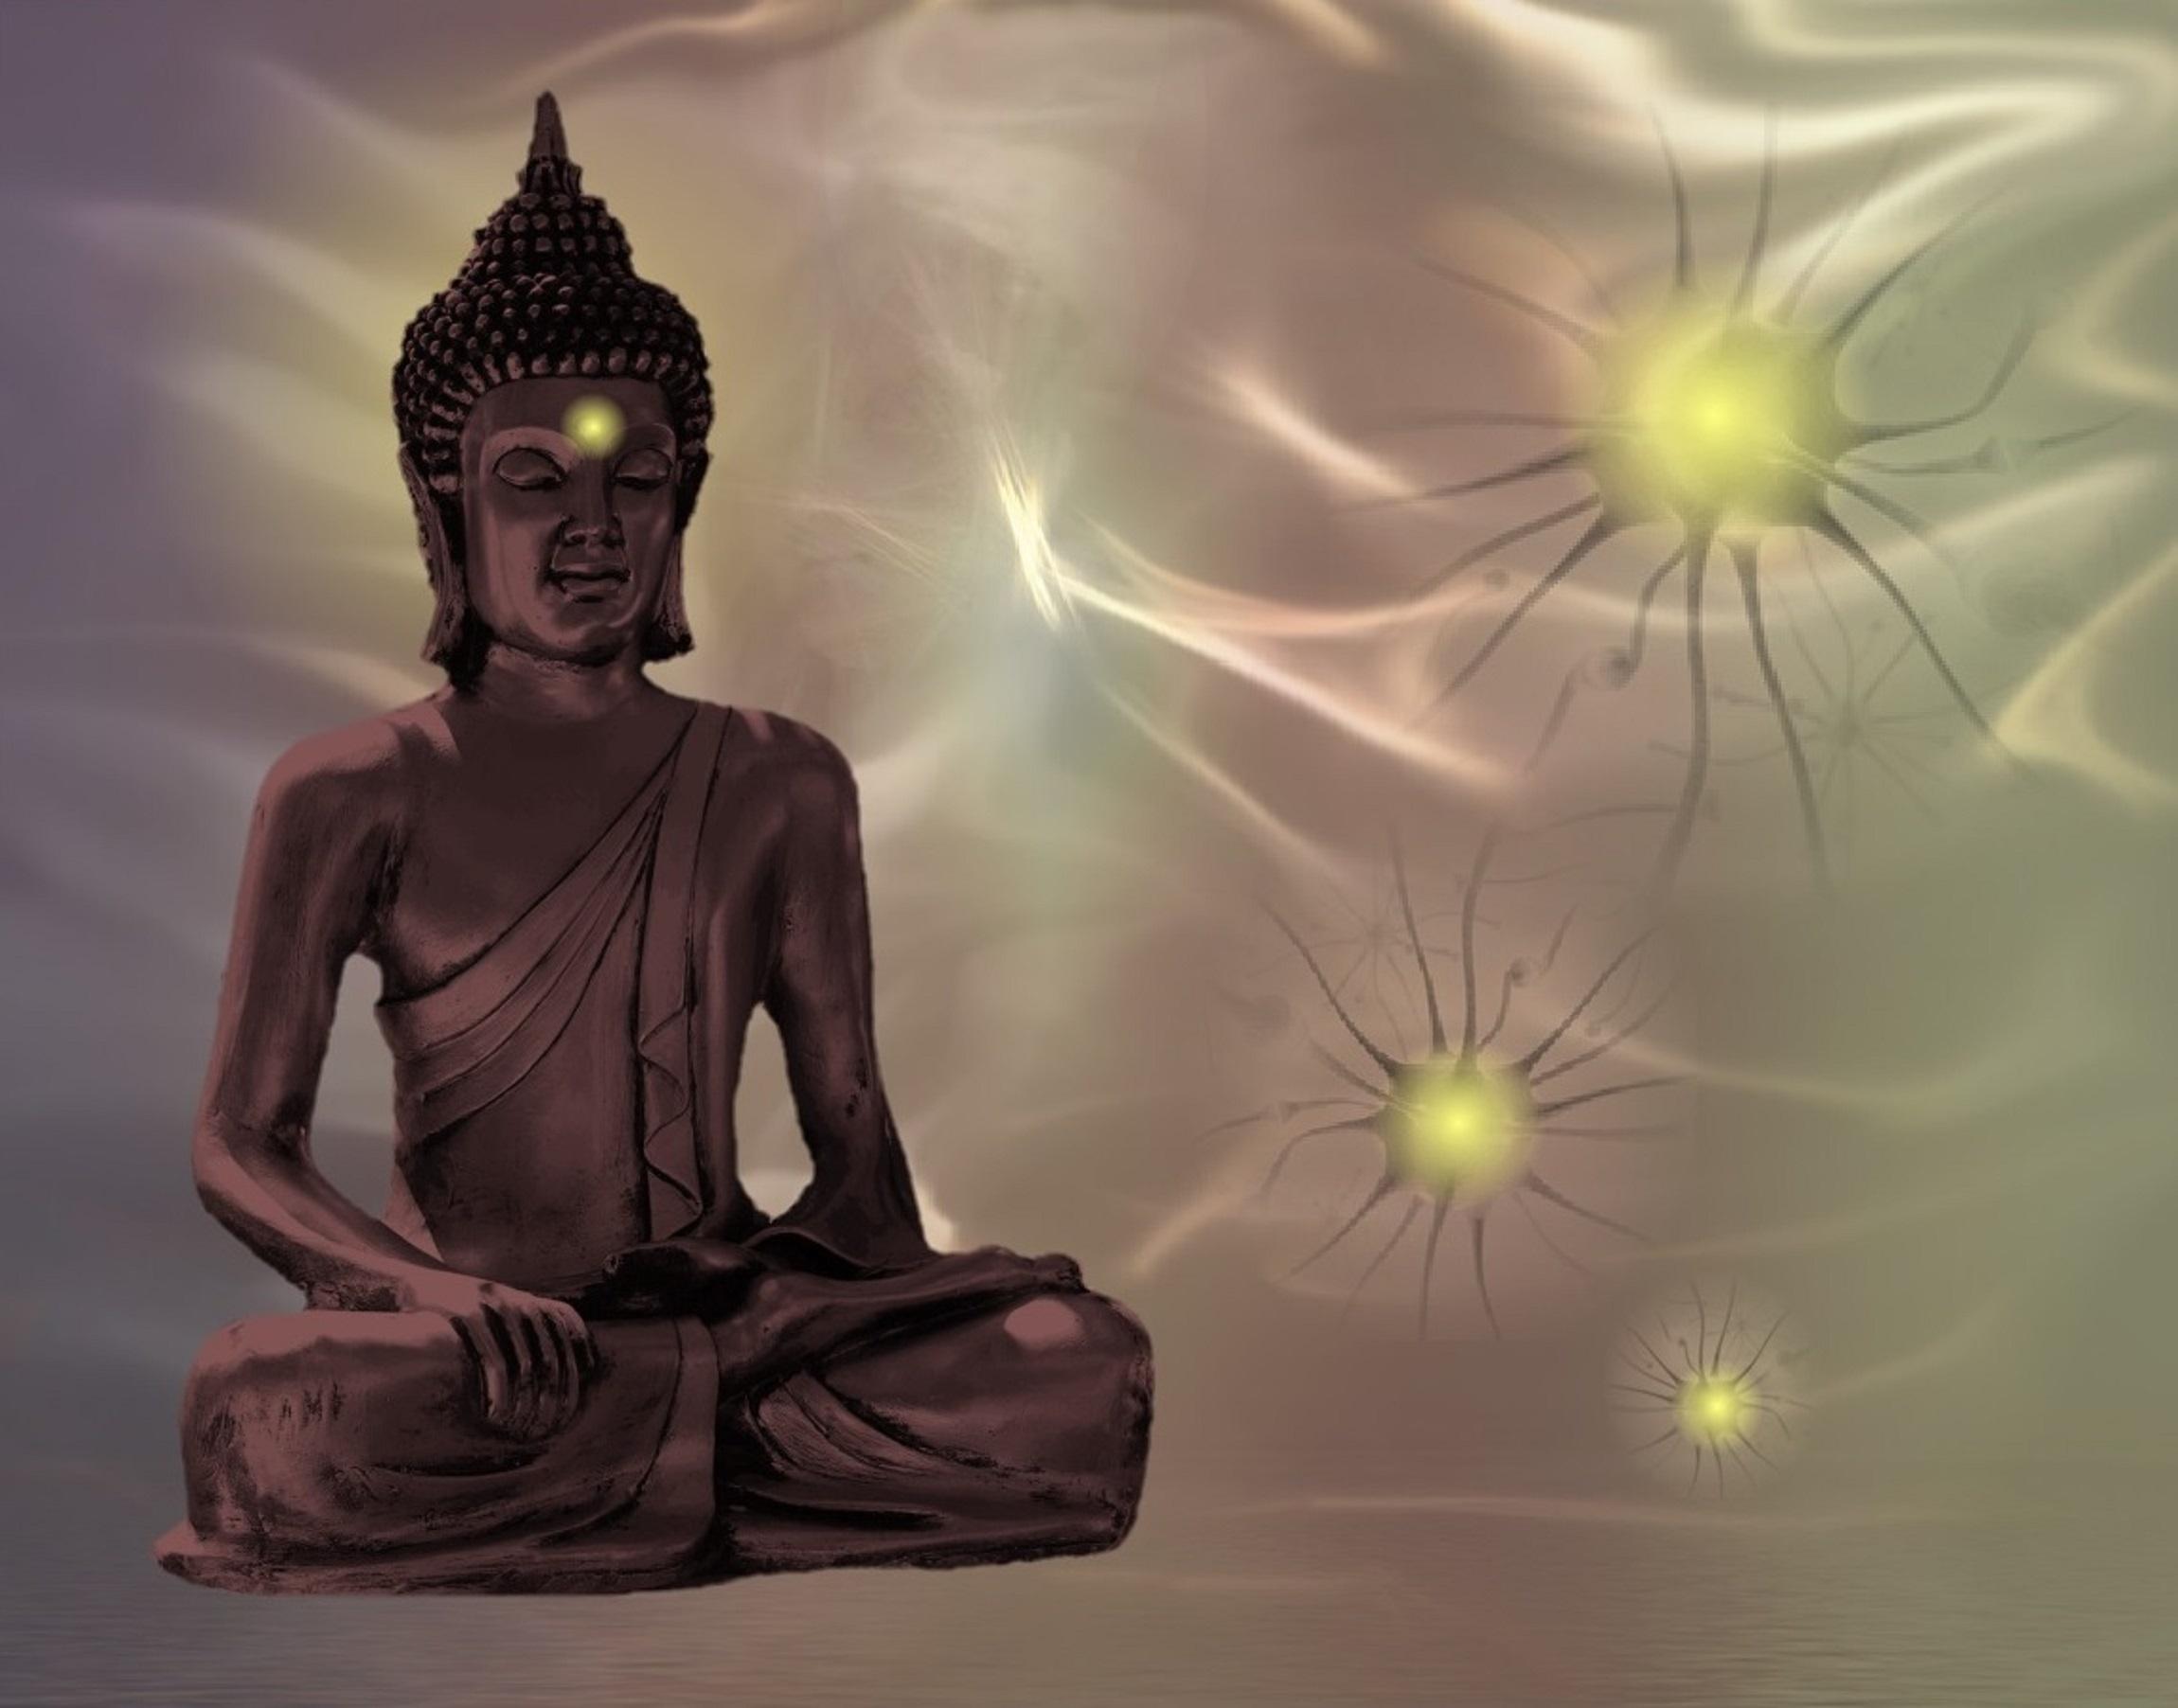 Asian meditation images porn mature